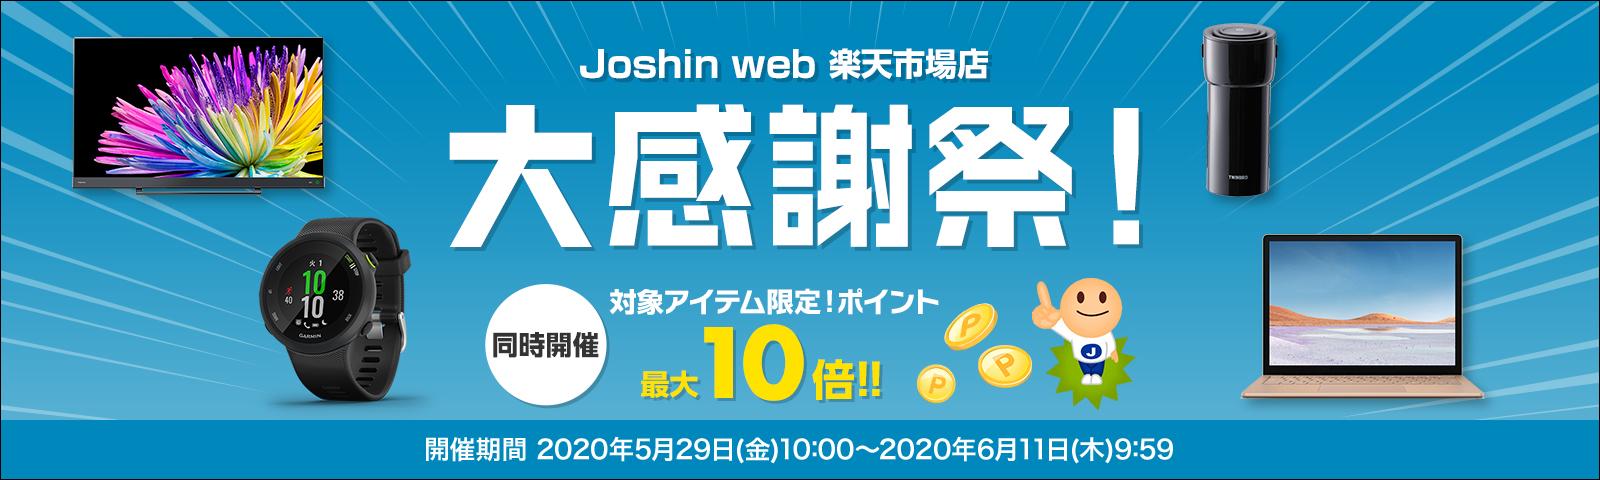 Web ジョーシン